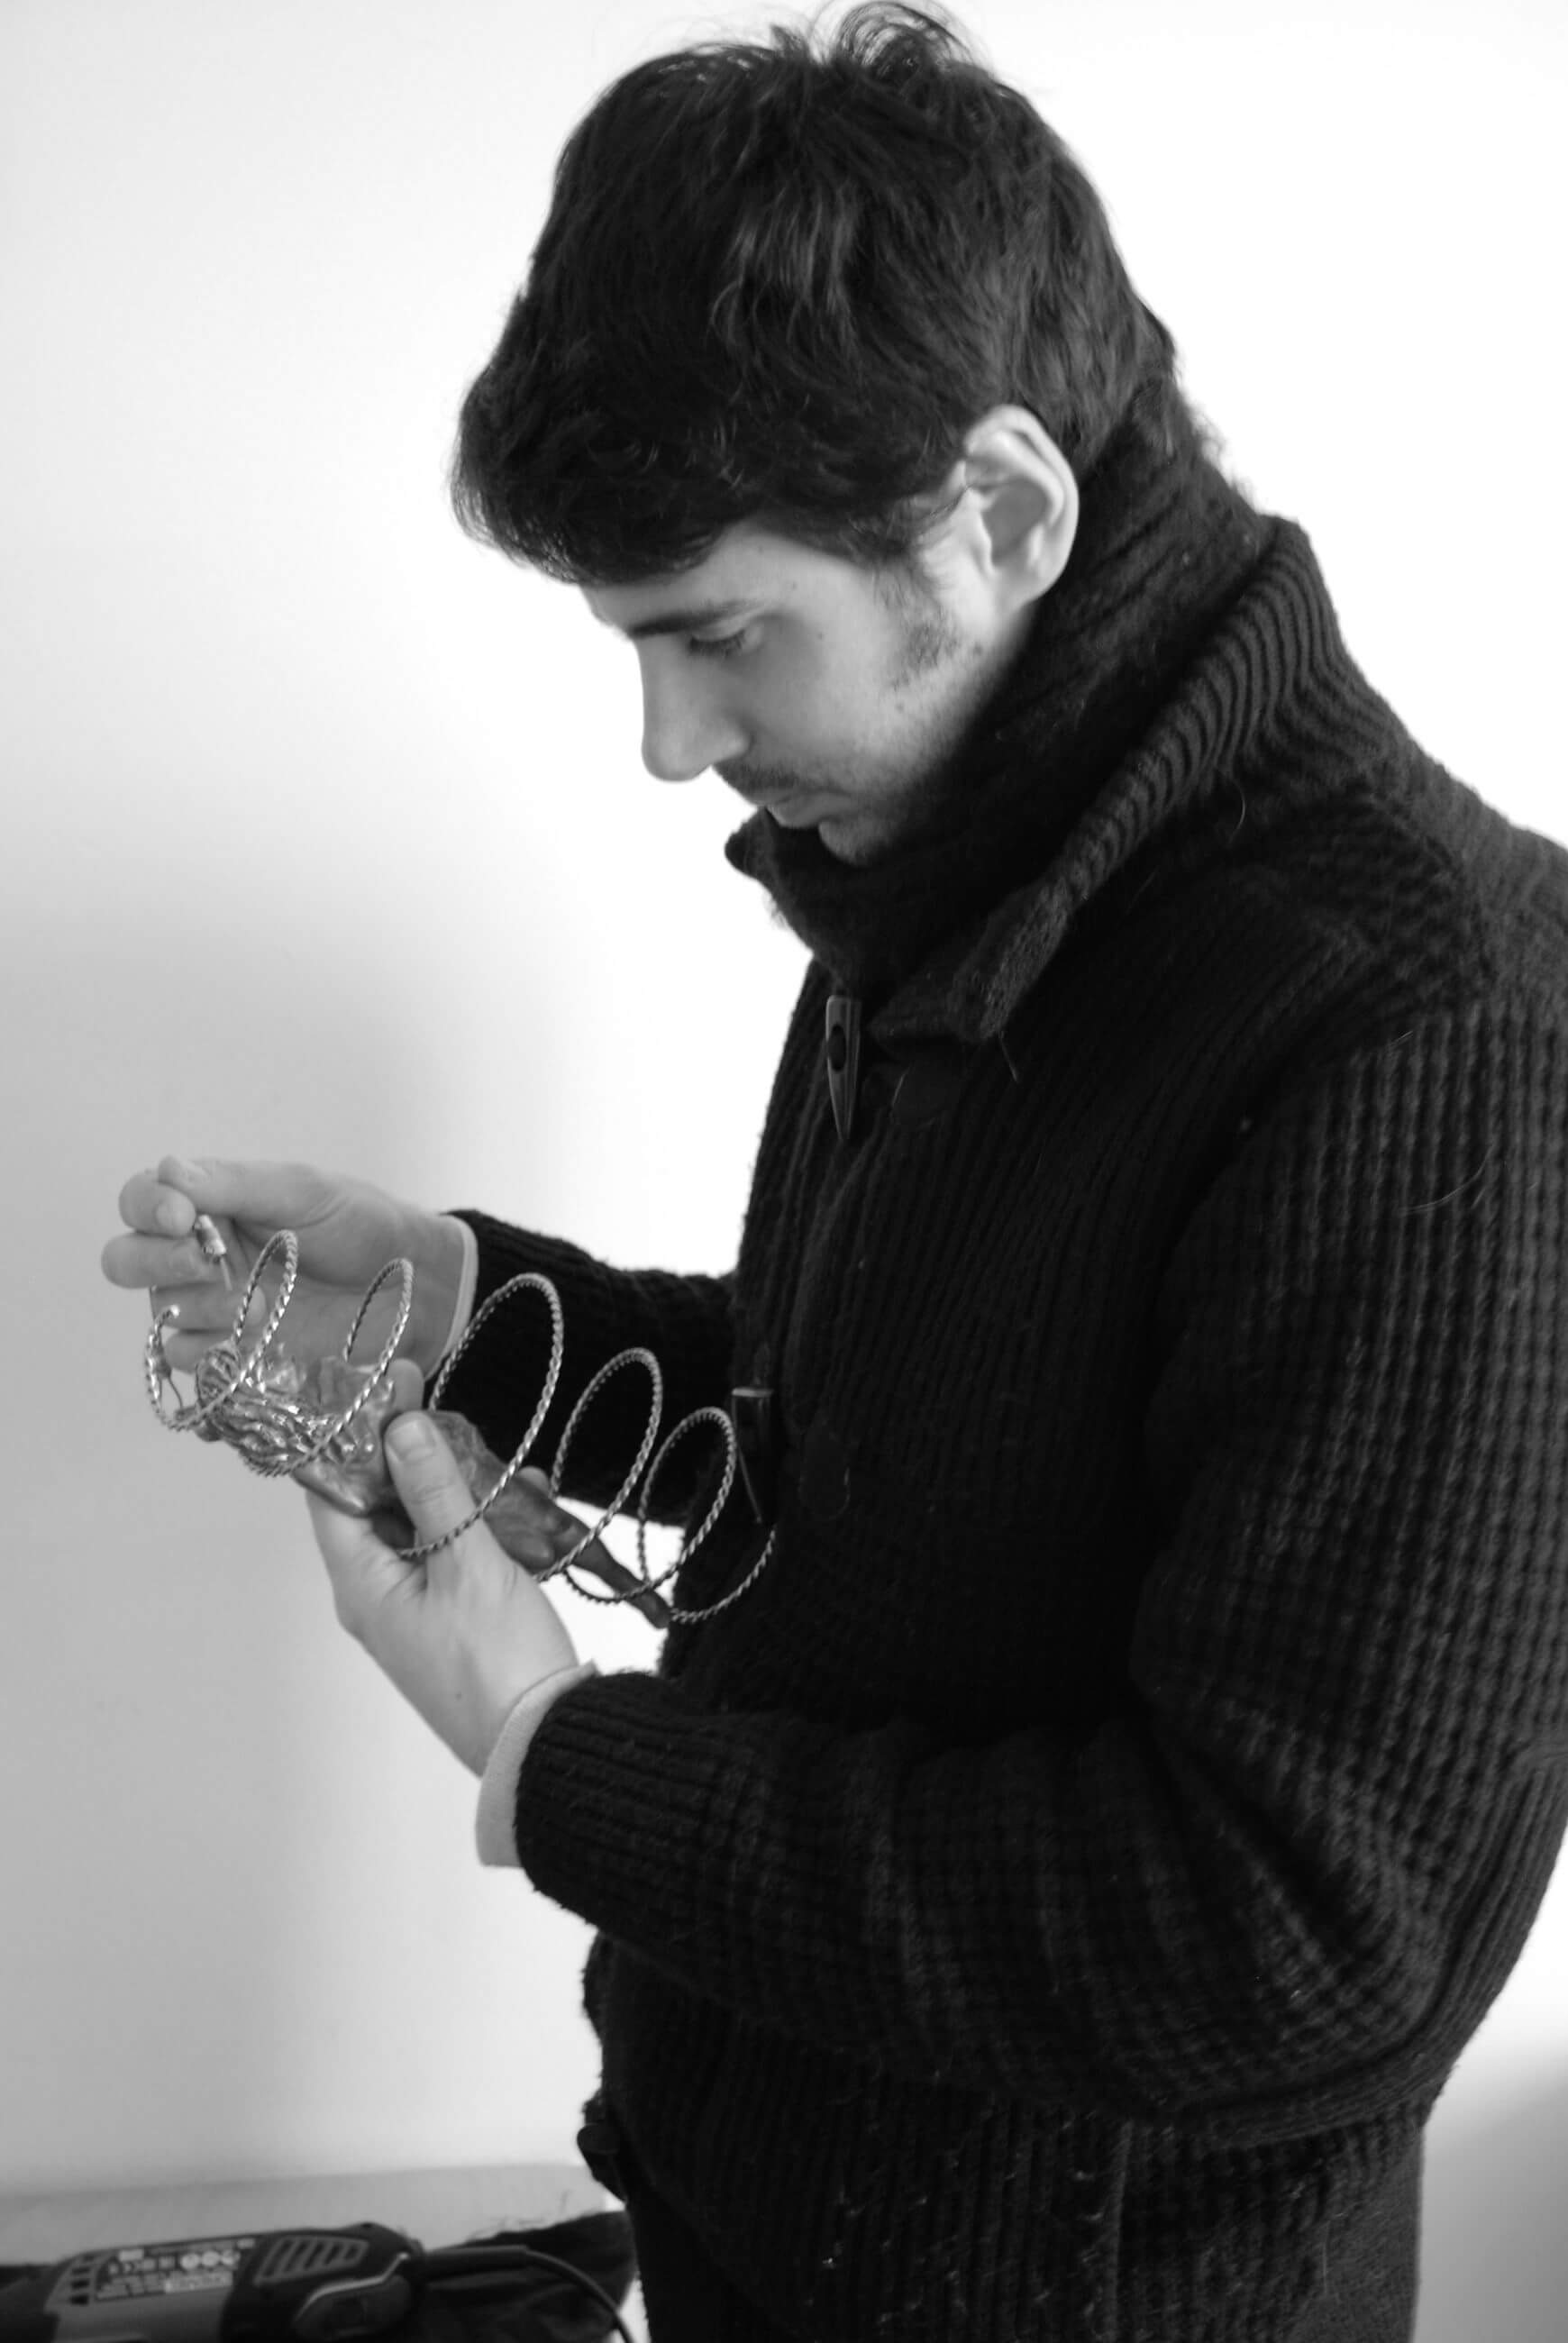 Nicolas Chuillet